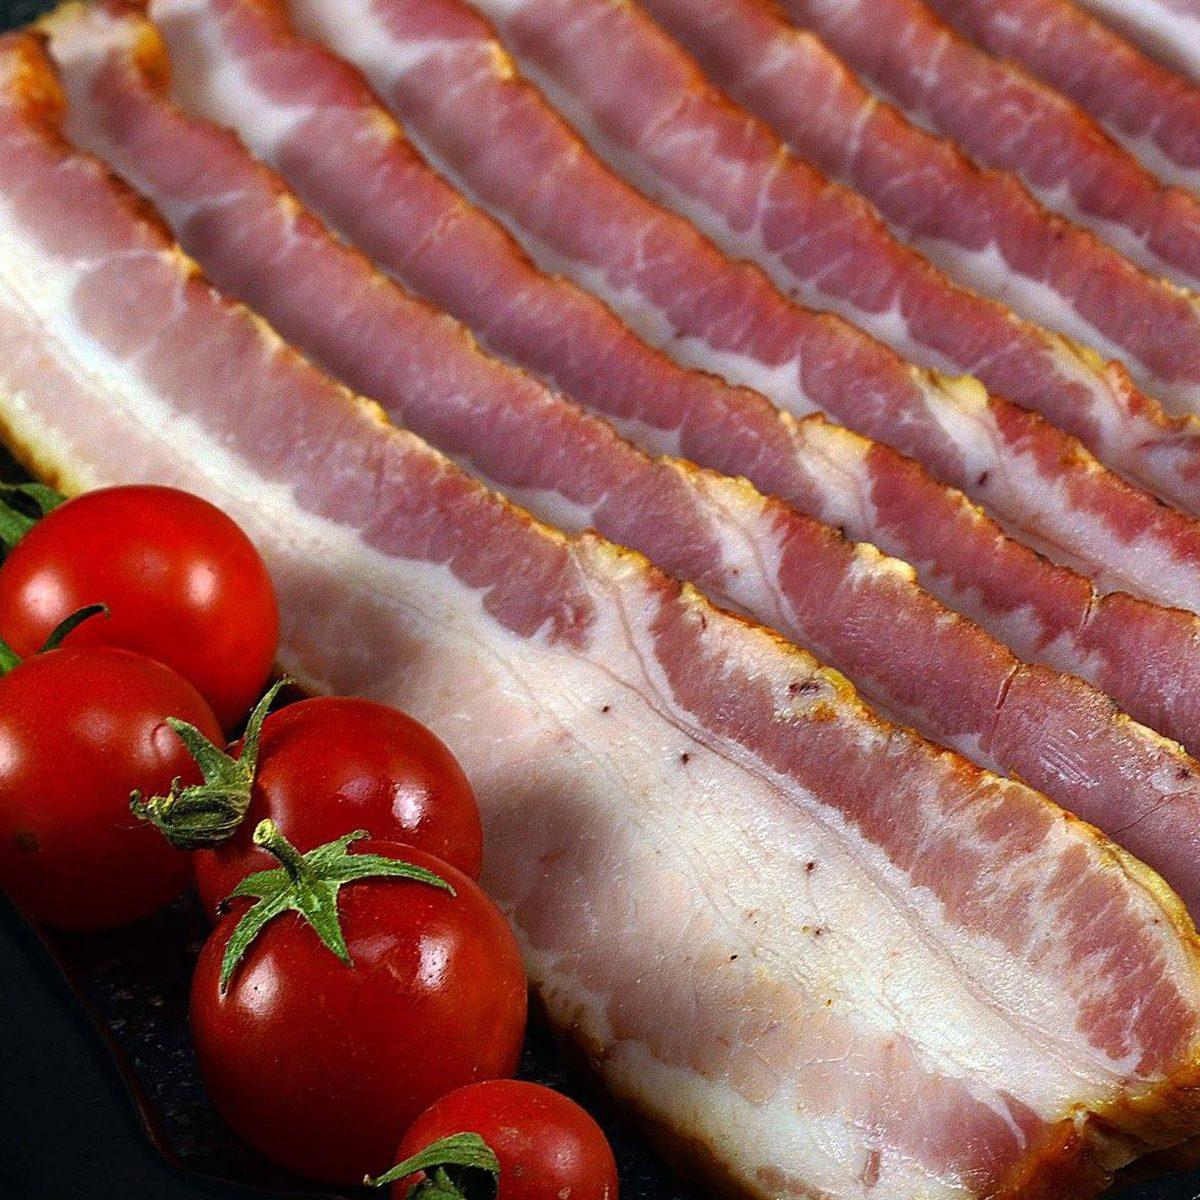 Best Bacon of Arizona